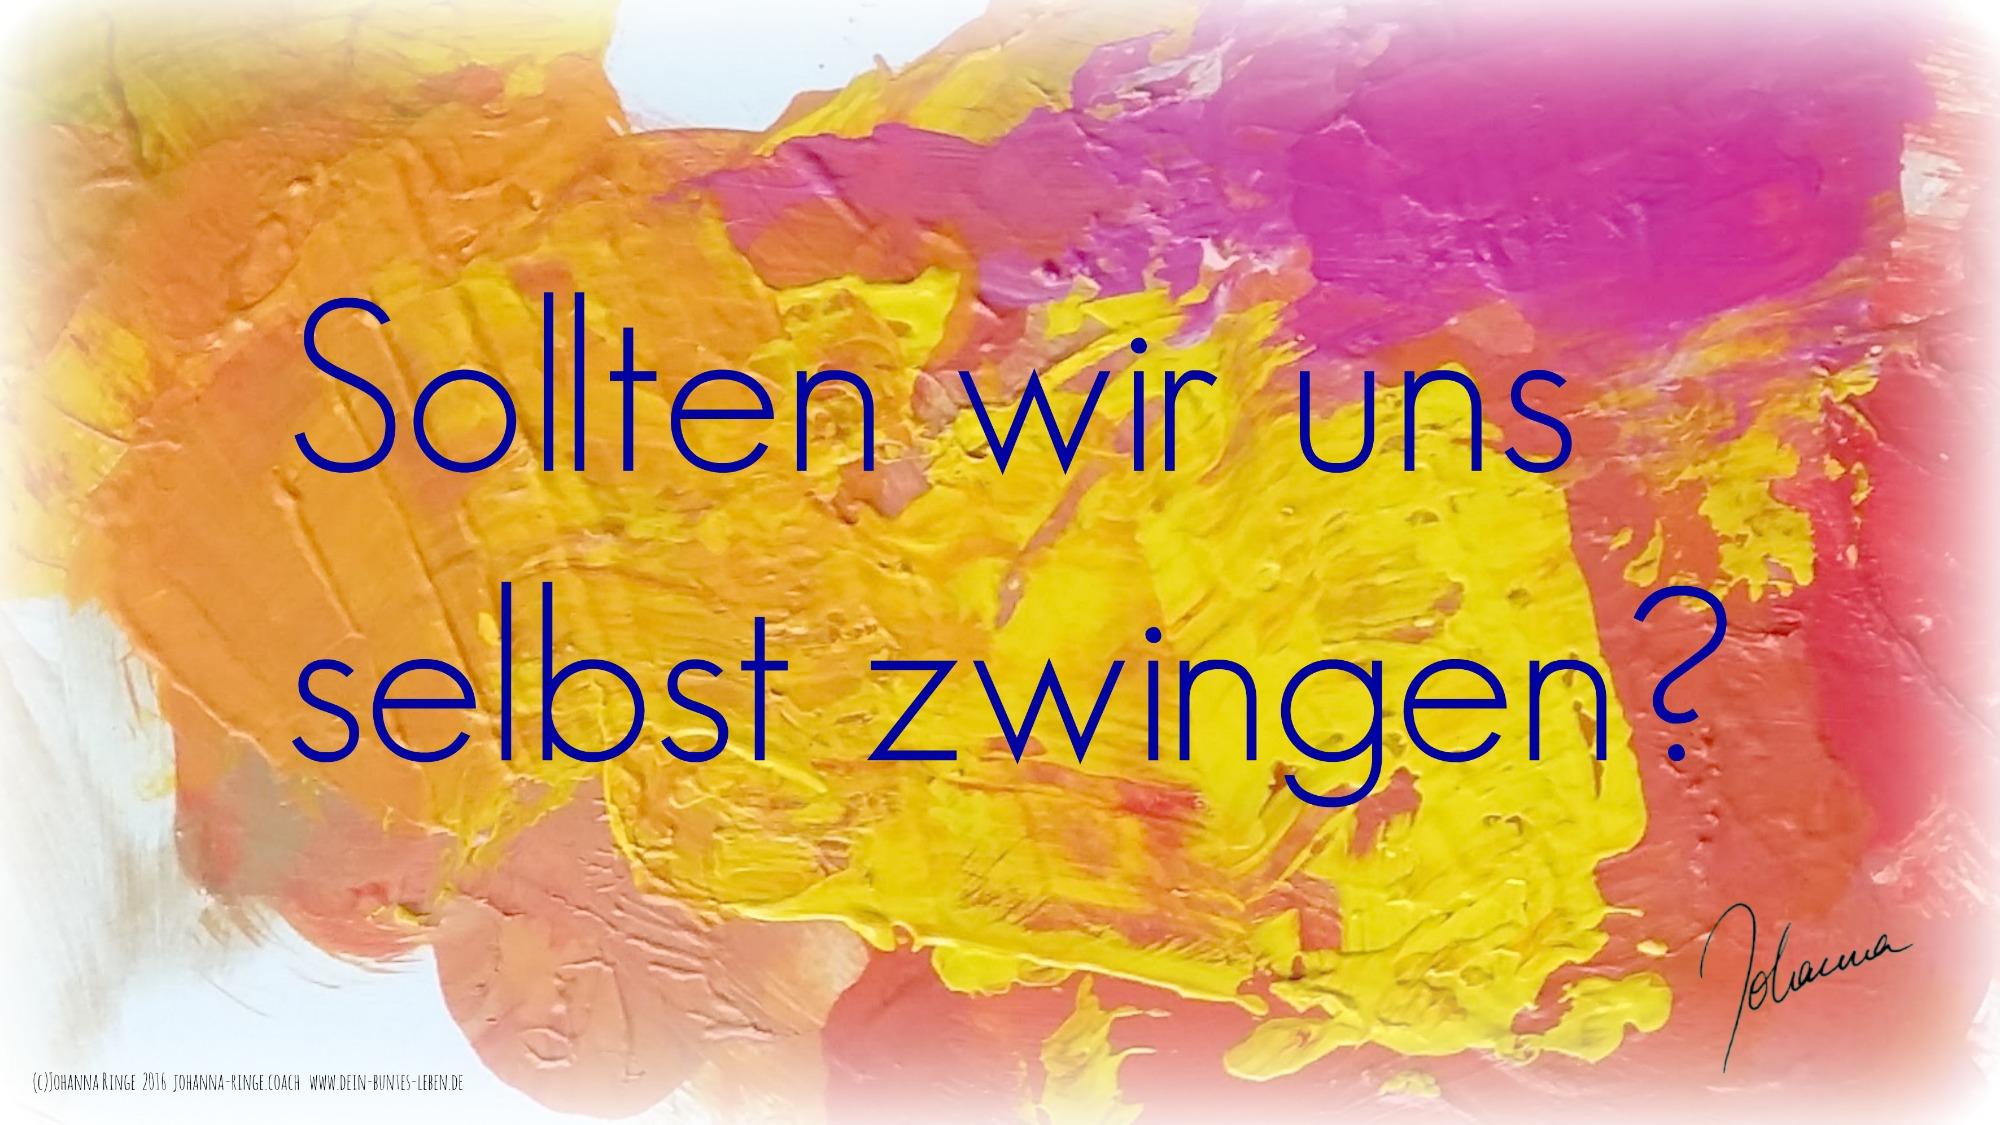 Sich selbst zwingen? (c) Johanna Ringe 2016 www.dein-buntes-leben.de johanna-ringe.coach